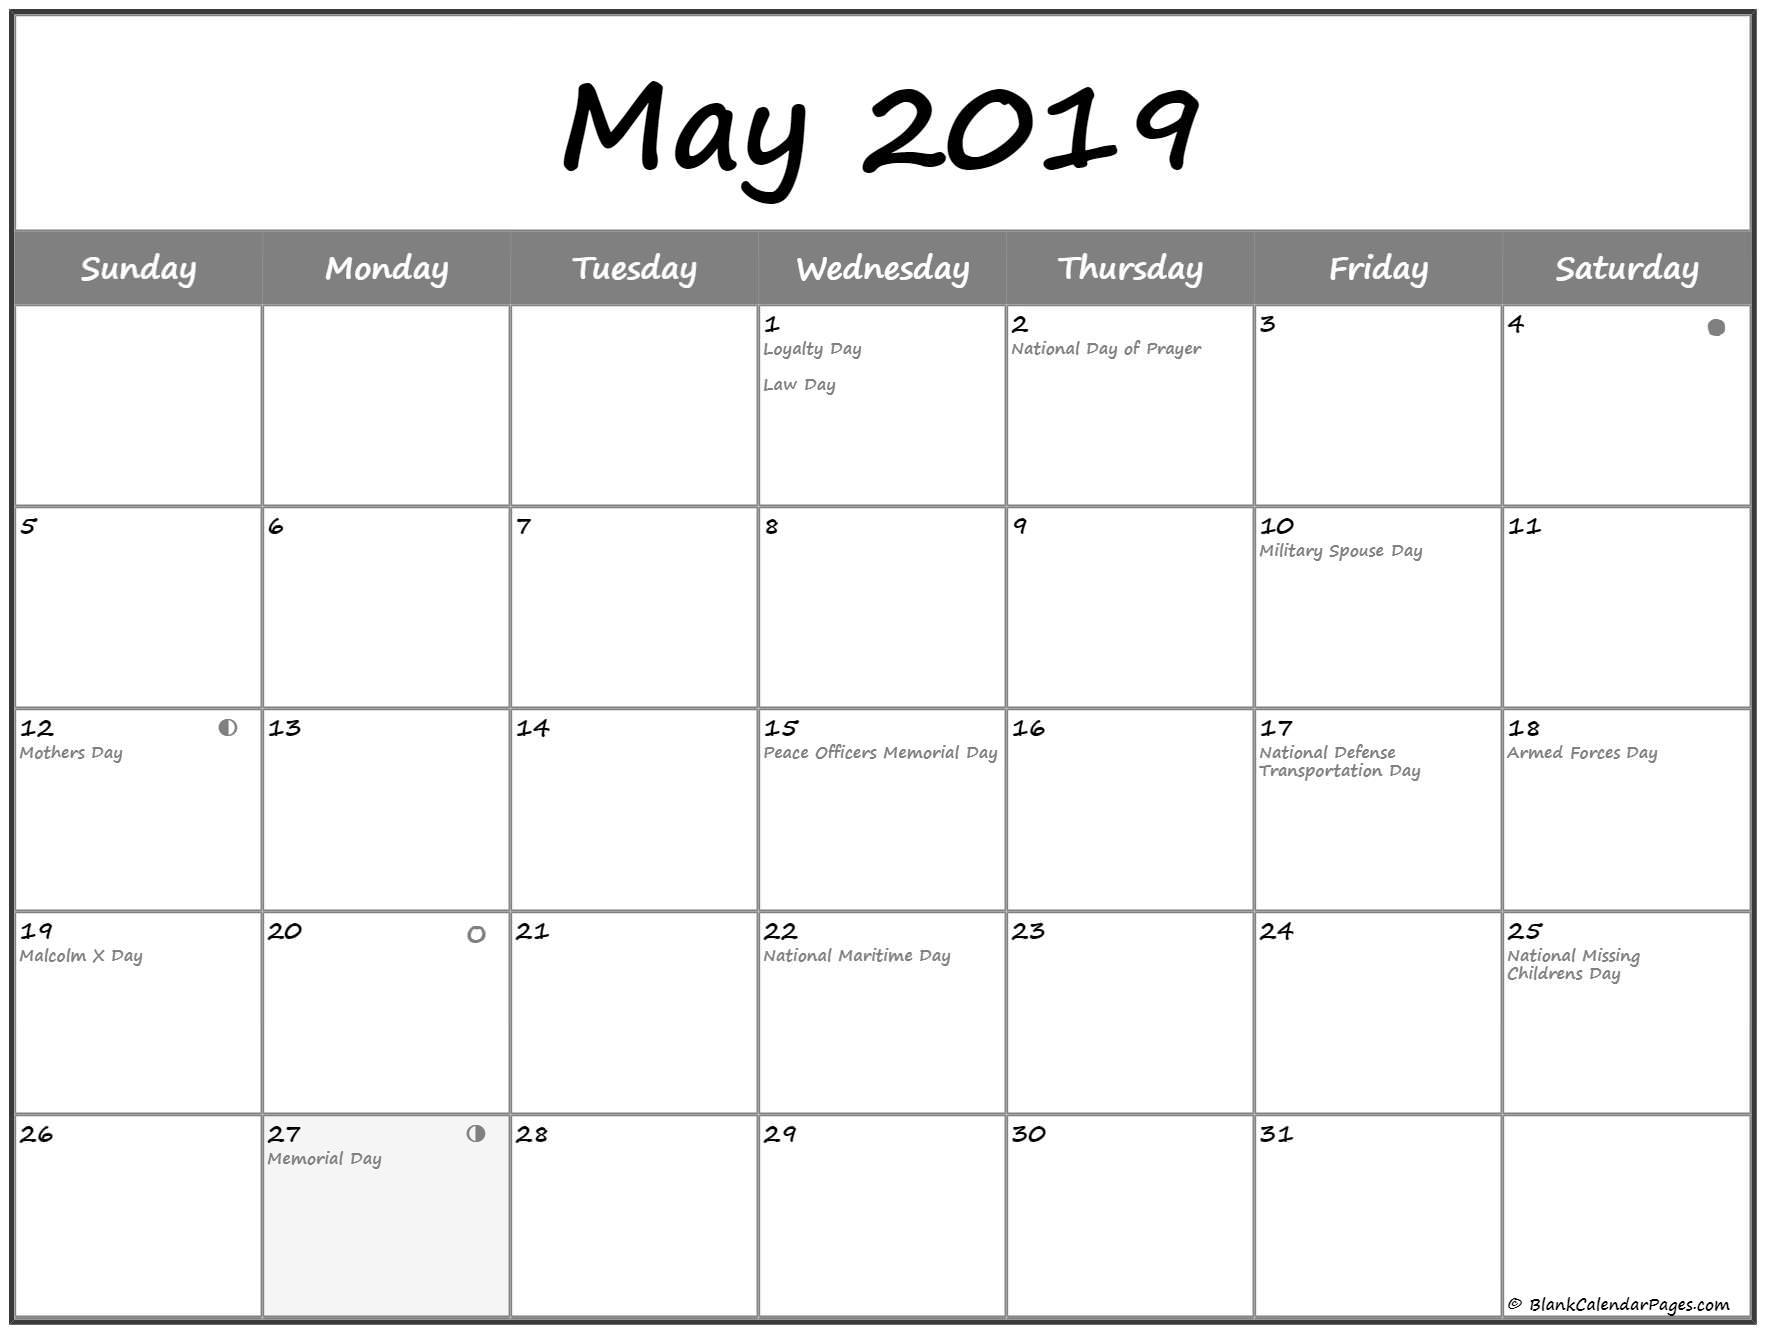 Moon Phases Calendar For May 2020 | May 2020 Lunar Calendar